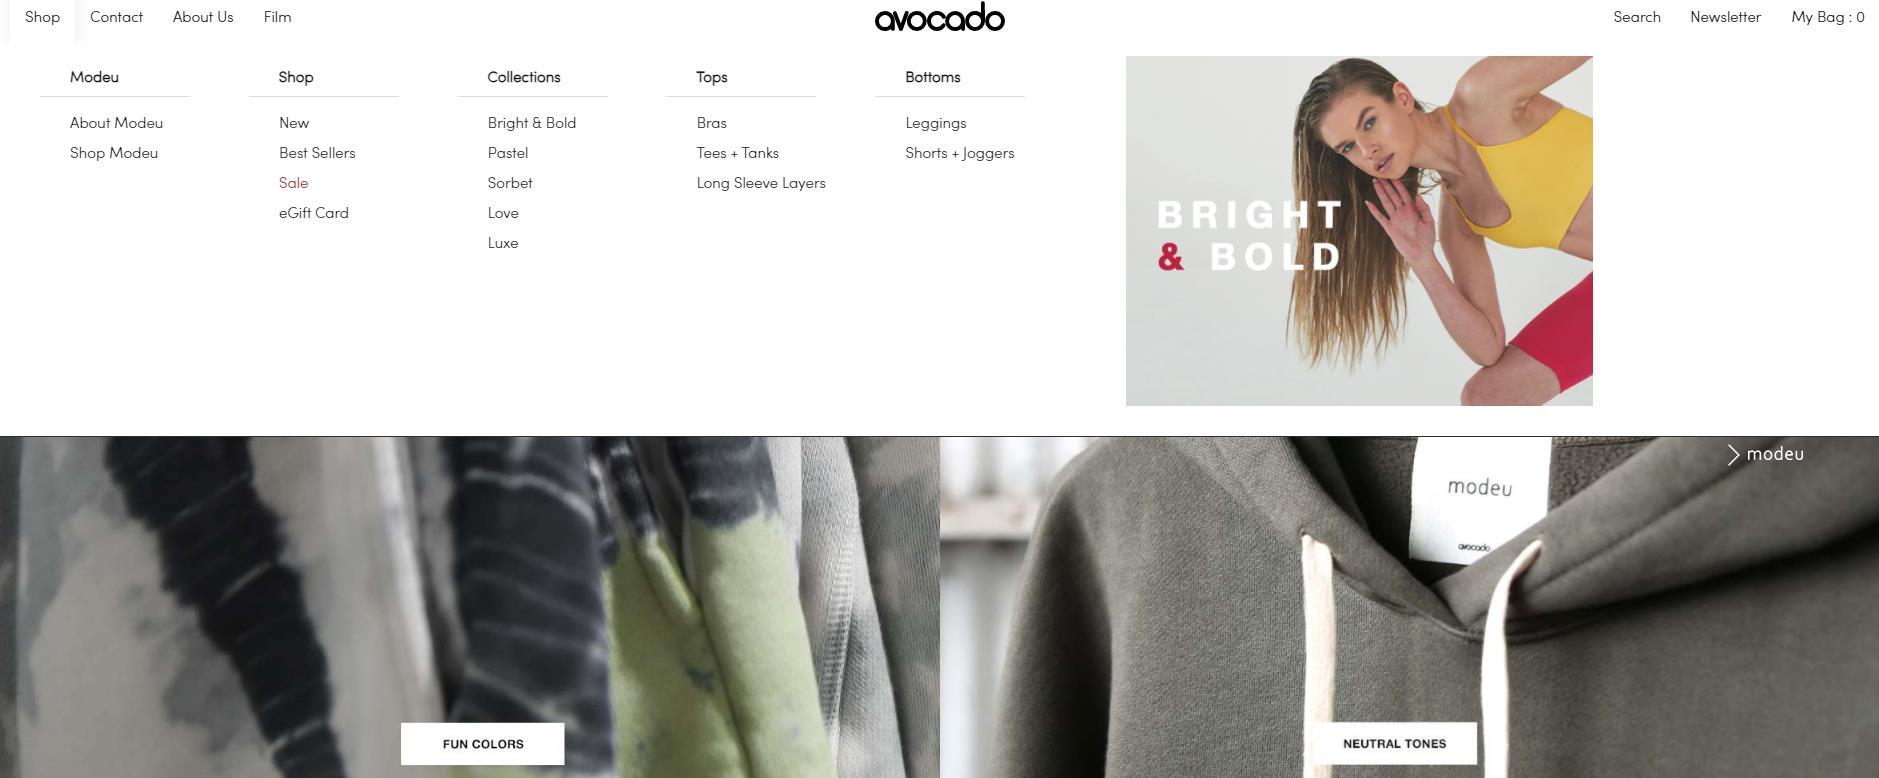 Avocado官网 Avocado官方旗舰店 美国运动服饰品牌